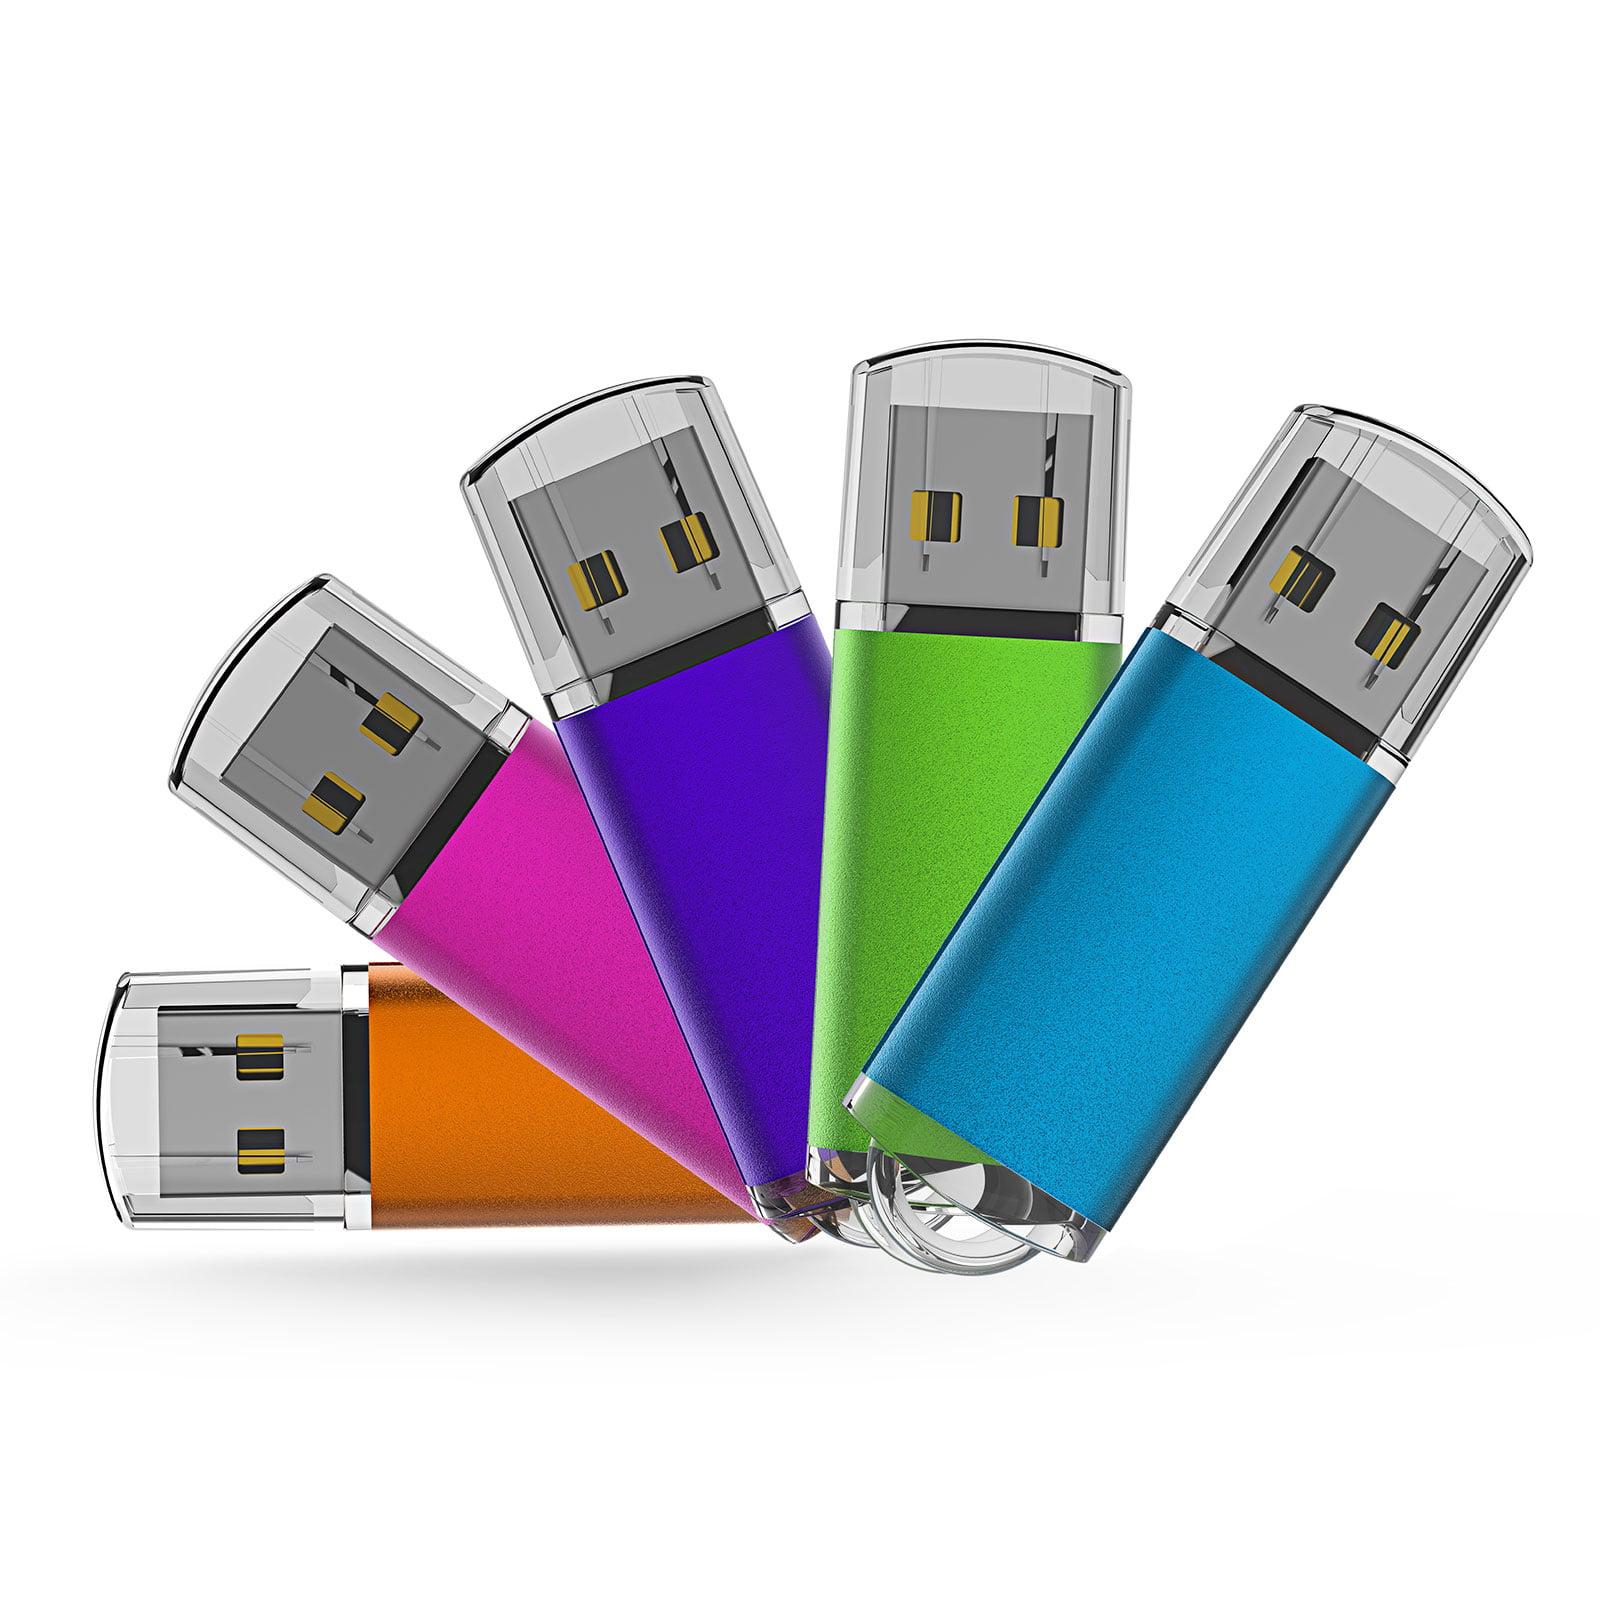 16GB Flash Drive Bulk 100 Pack USB2.0 Memory Sticks Multipack Portable Bracelet Thumb Drives PenDrive Jump Drive in Mixed Colors by FEBNISCTE